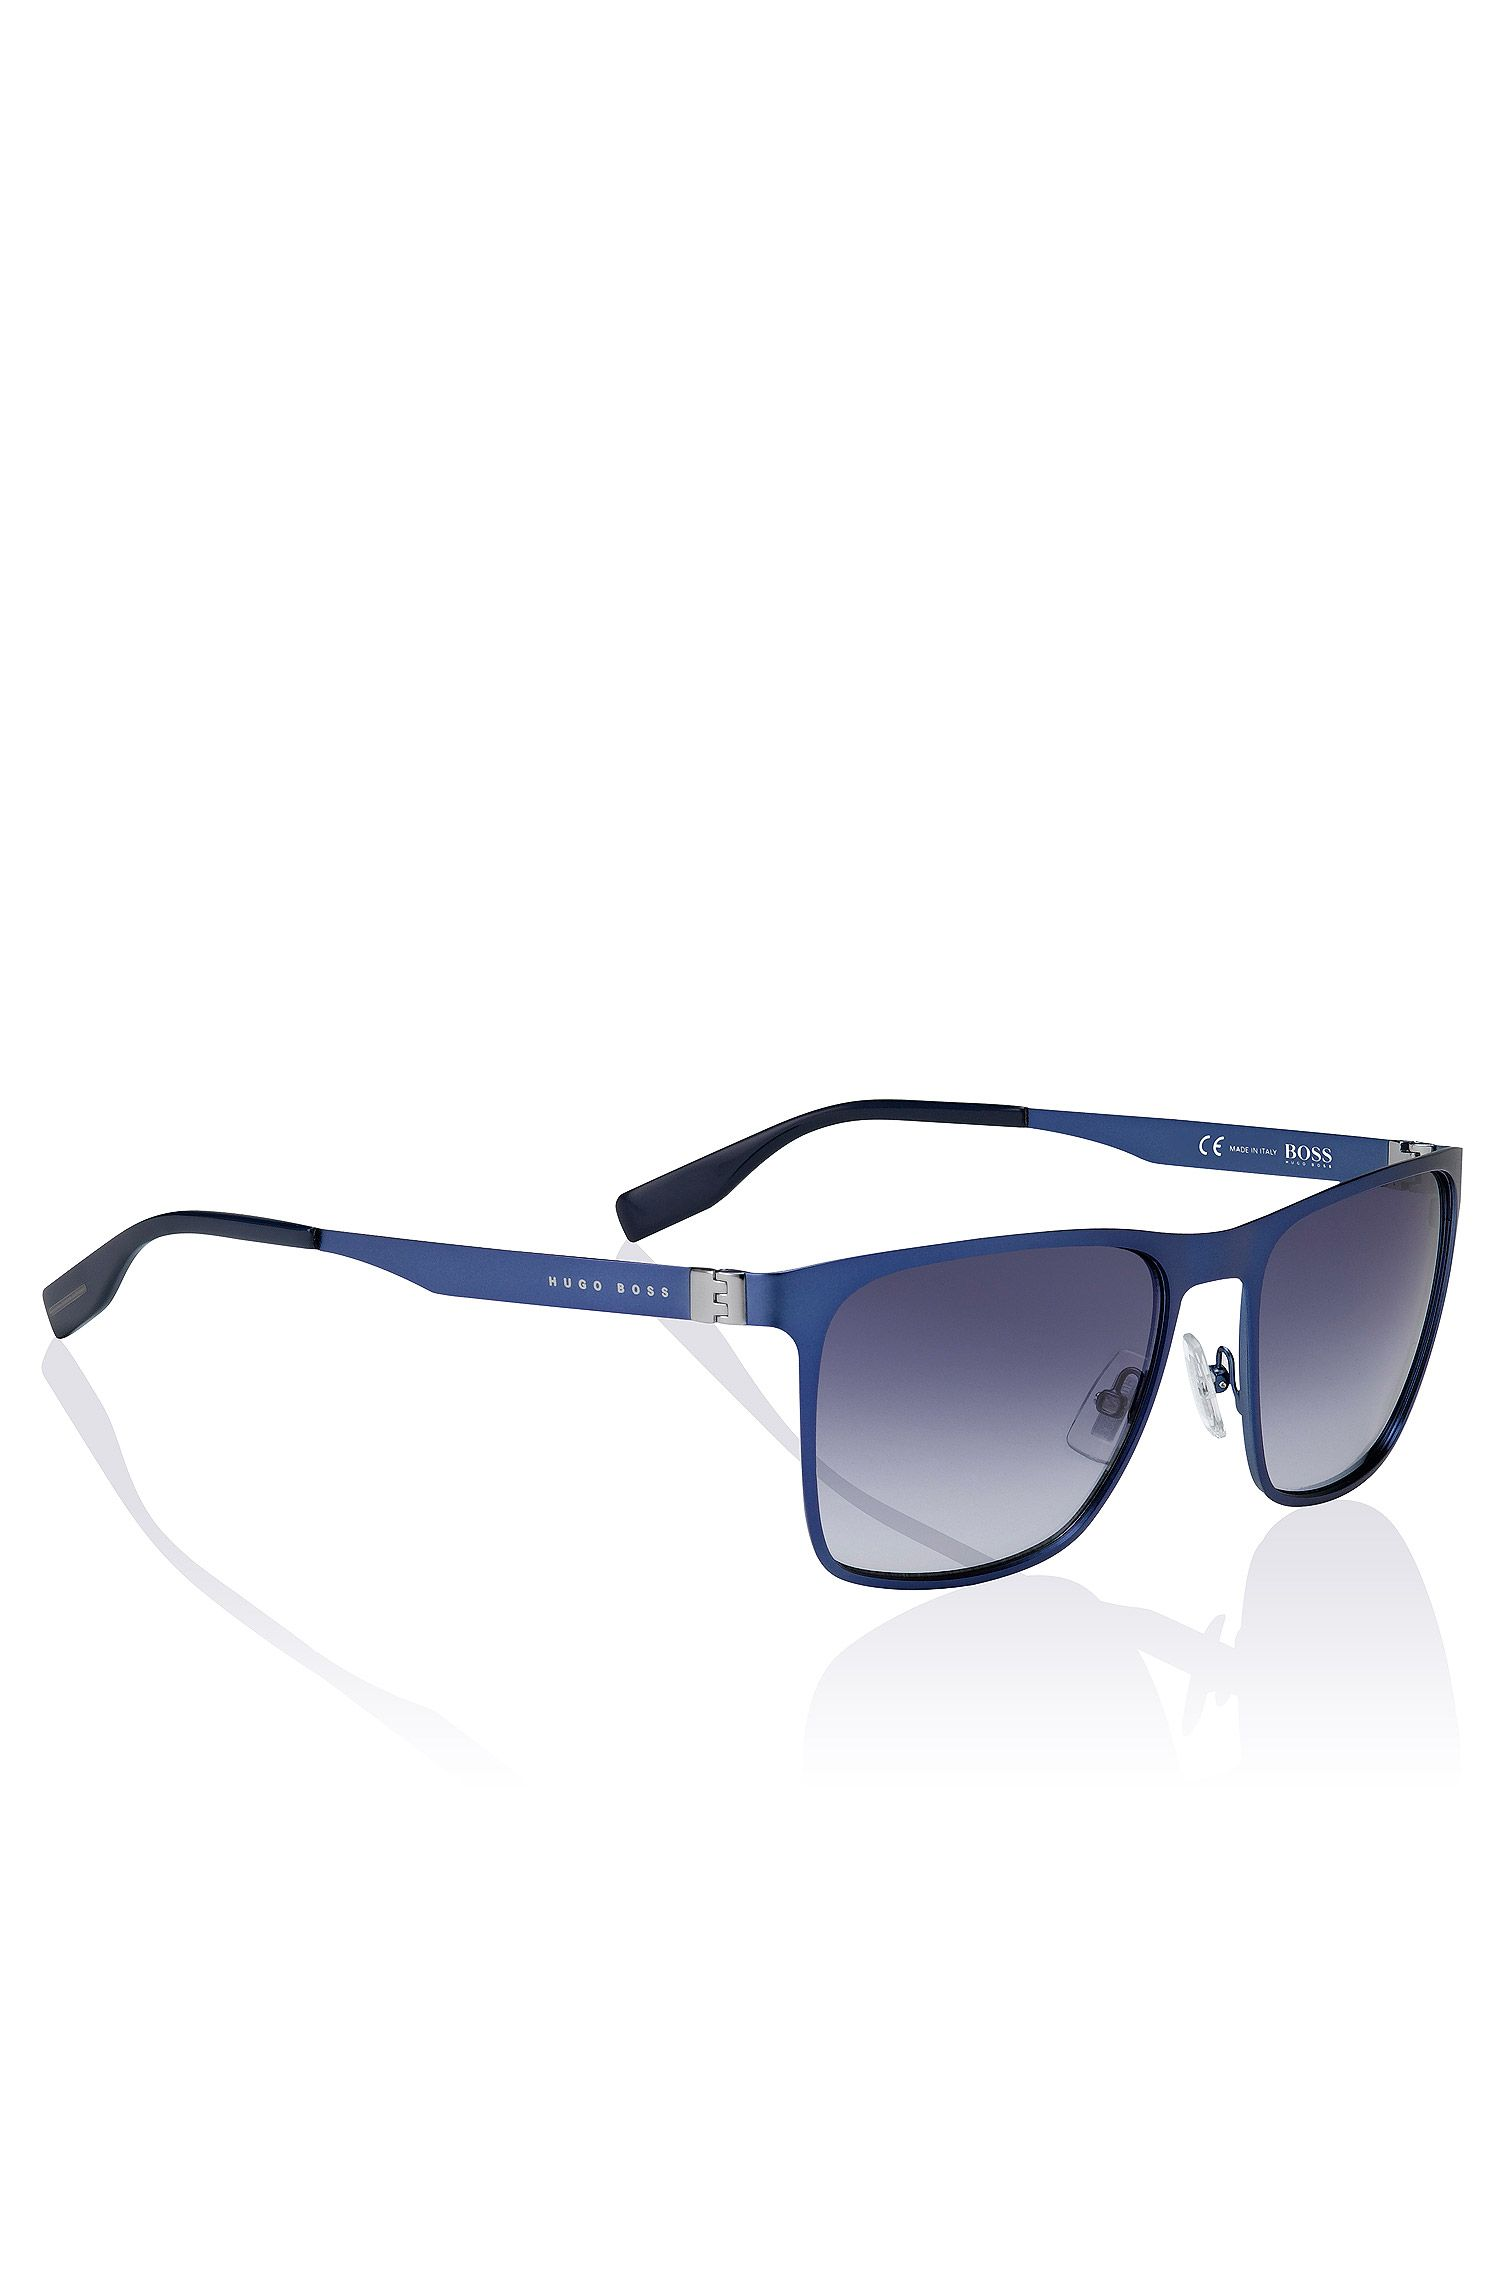 Sunglasses 'BOSS 0597/S'